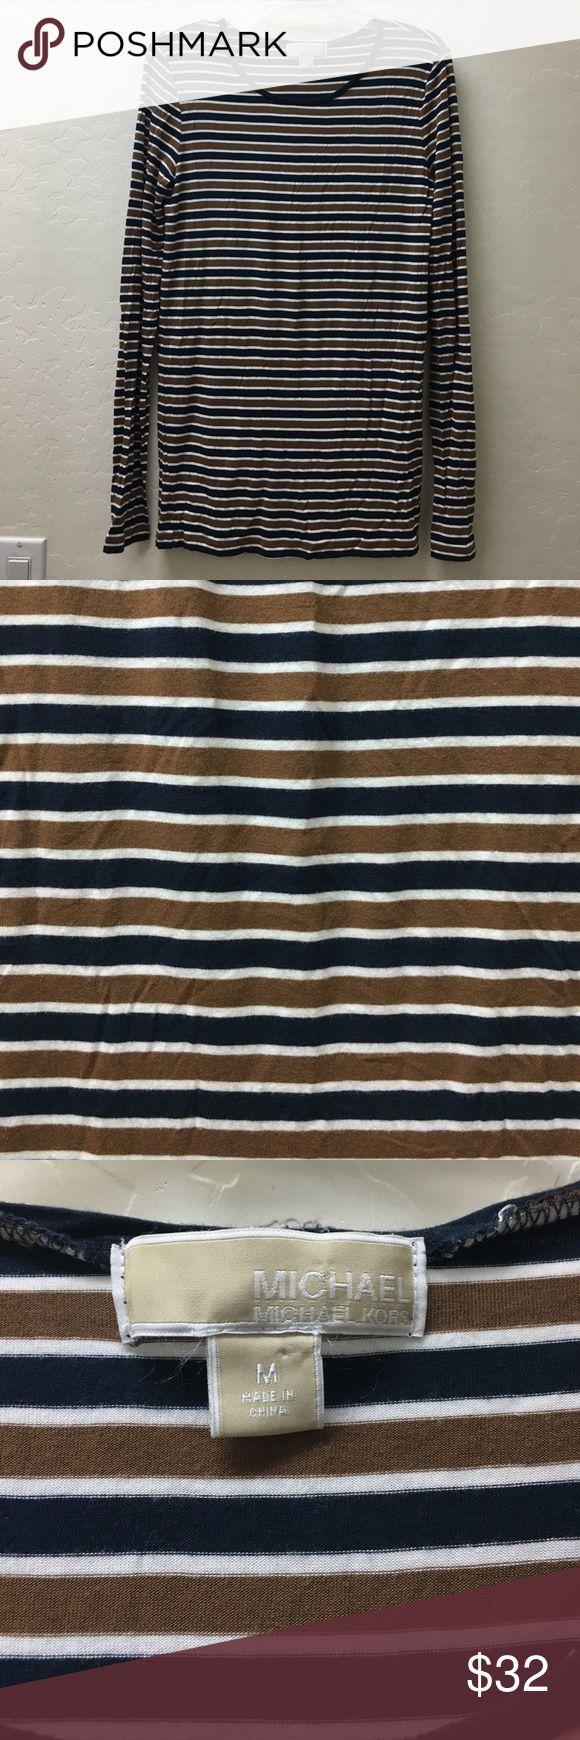 Lovely Michael Kors long sleeve Tshirt Lovely soft Micheal Kors Horizonal strips Tshirt . EUC MICHAEL Michael Kors Tops Tees - Short Sleeve